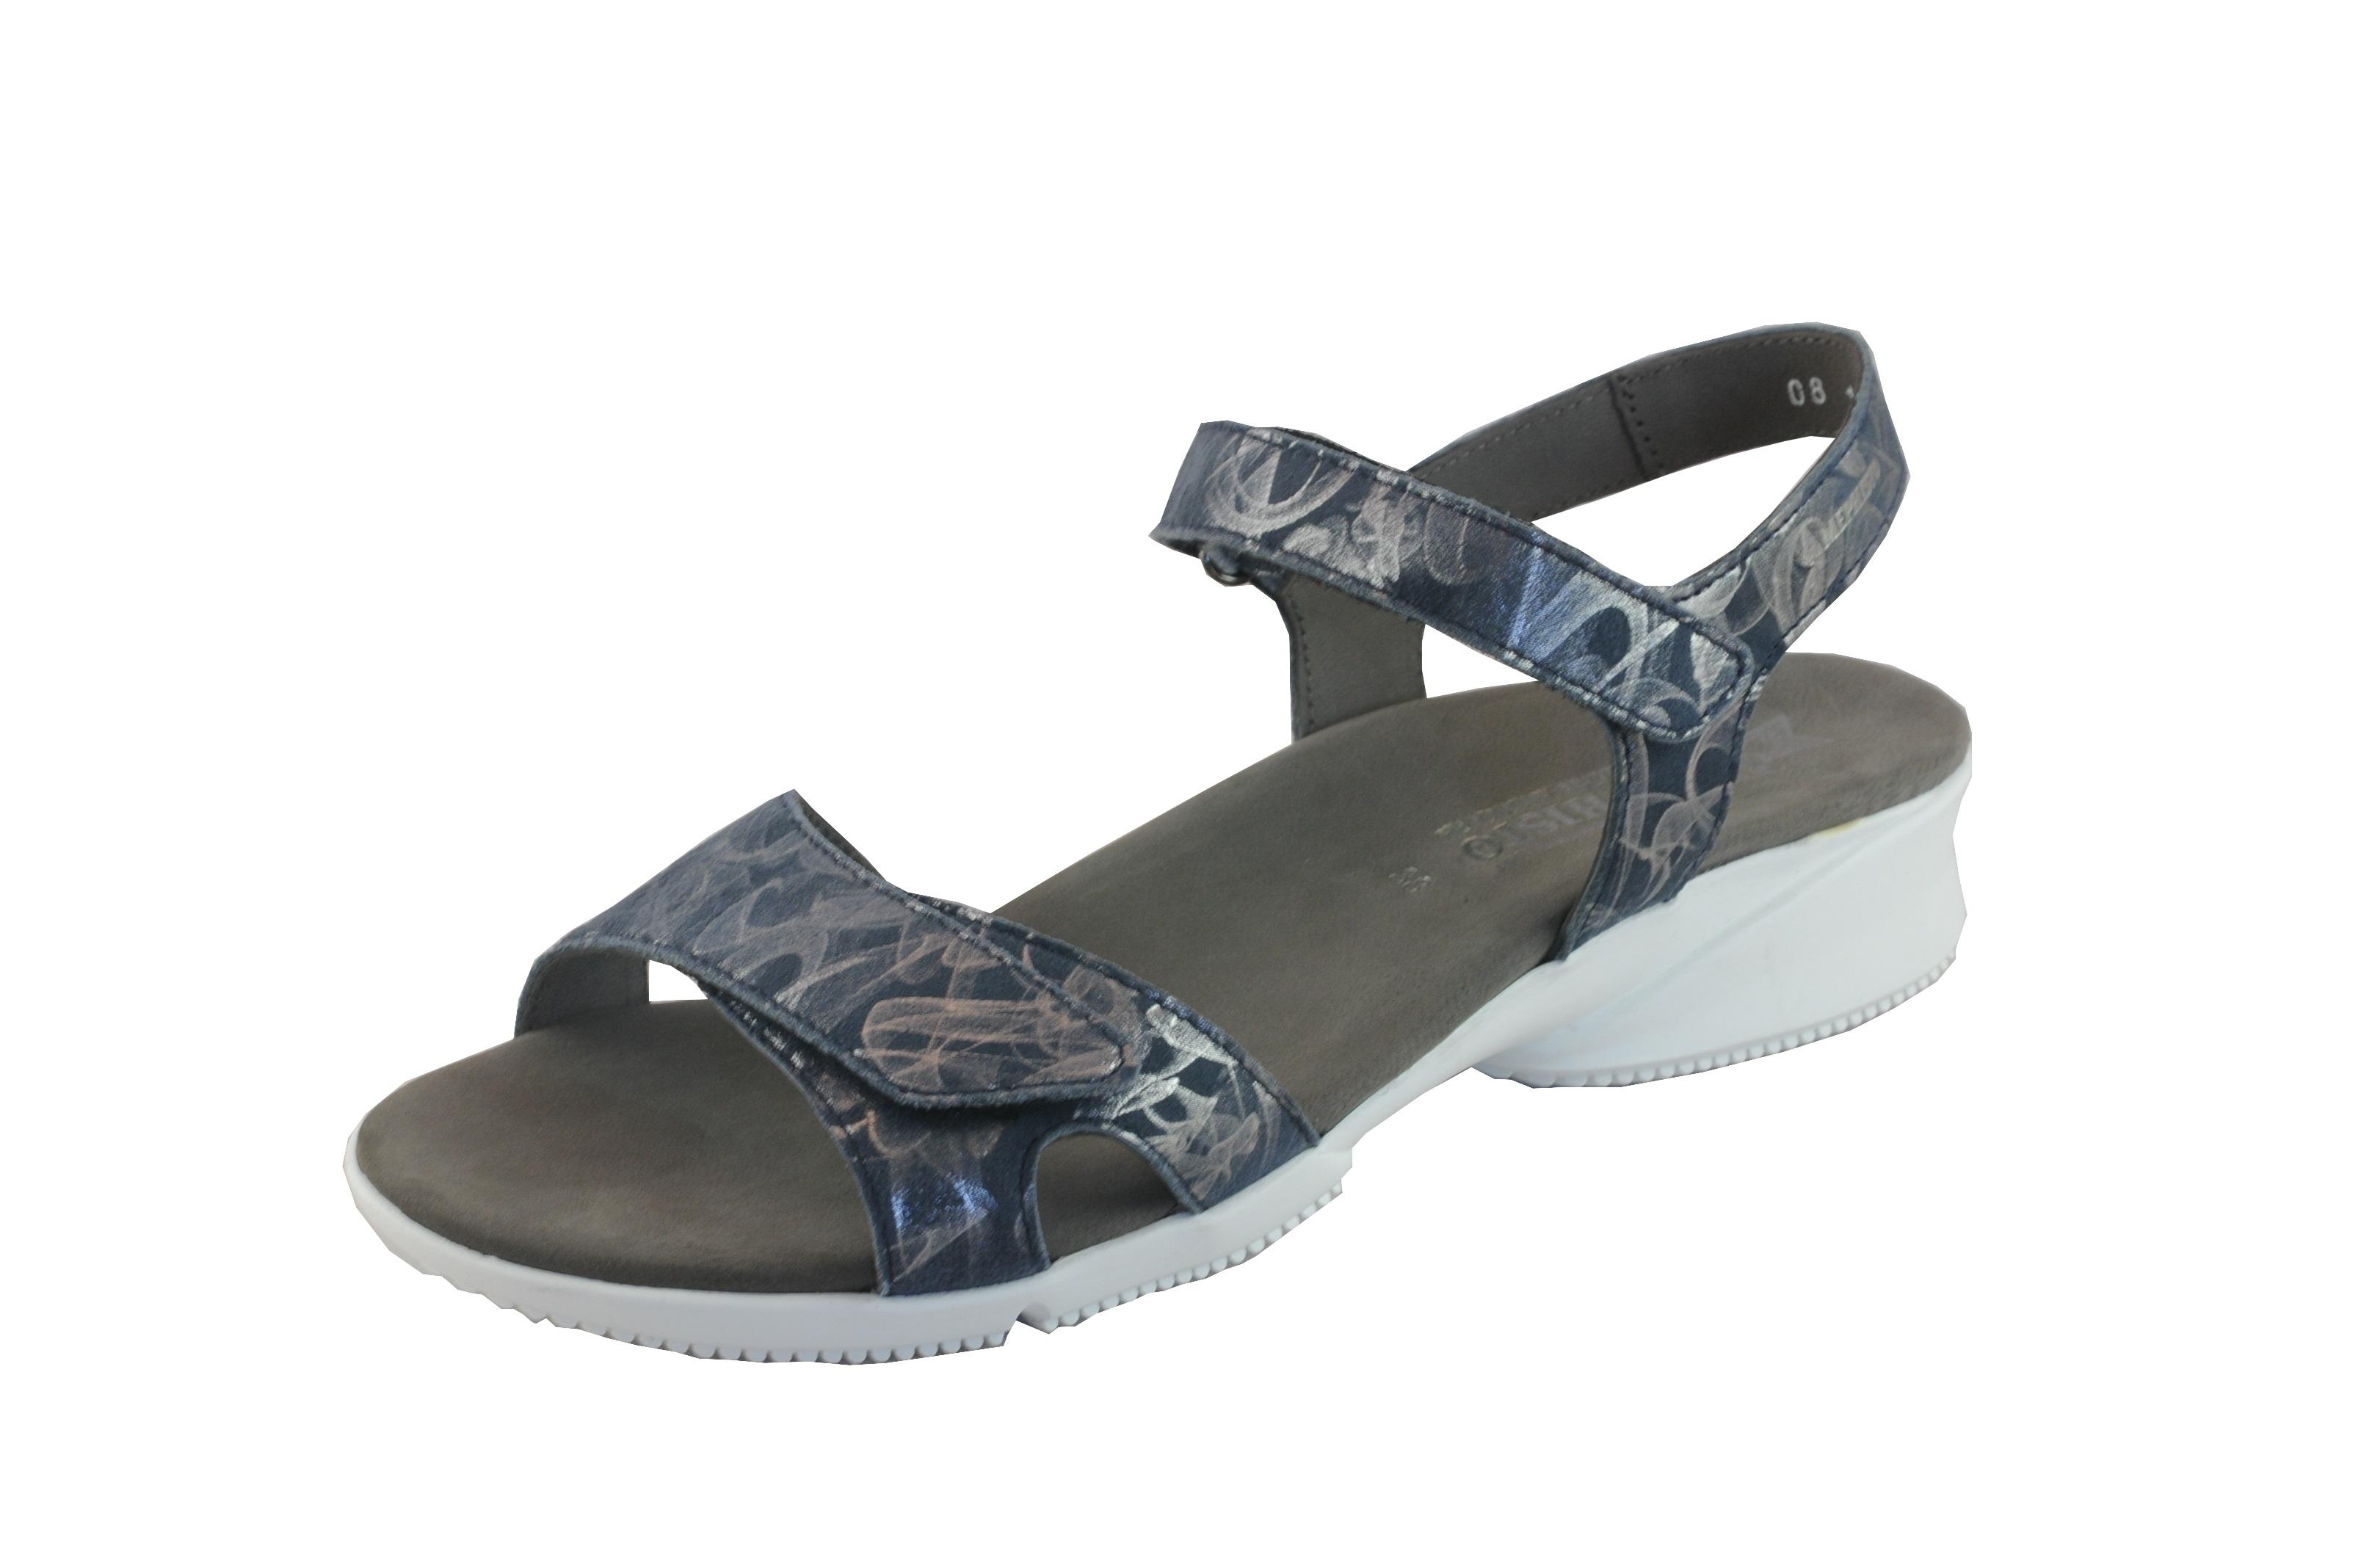 Sandalen, Nubukleder, Klettverschluss